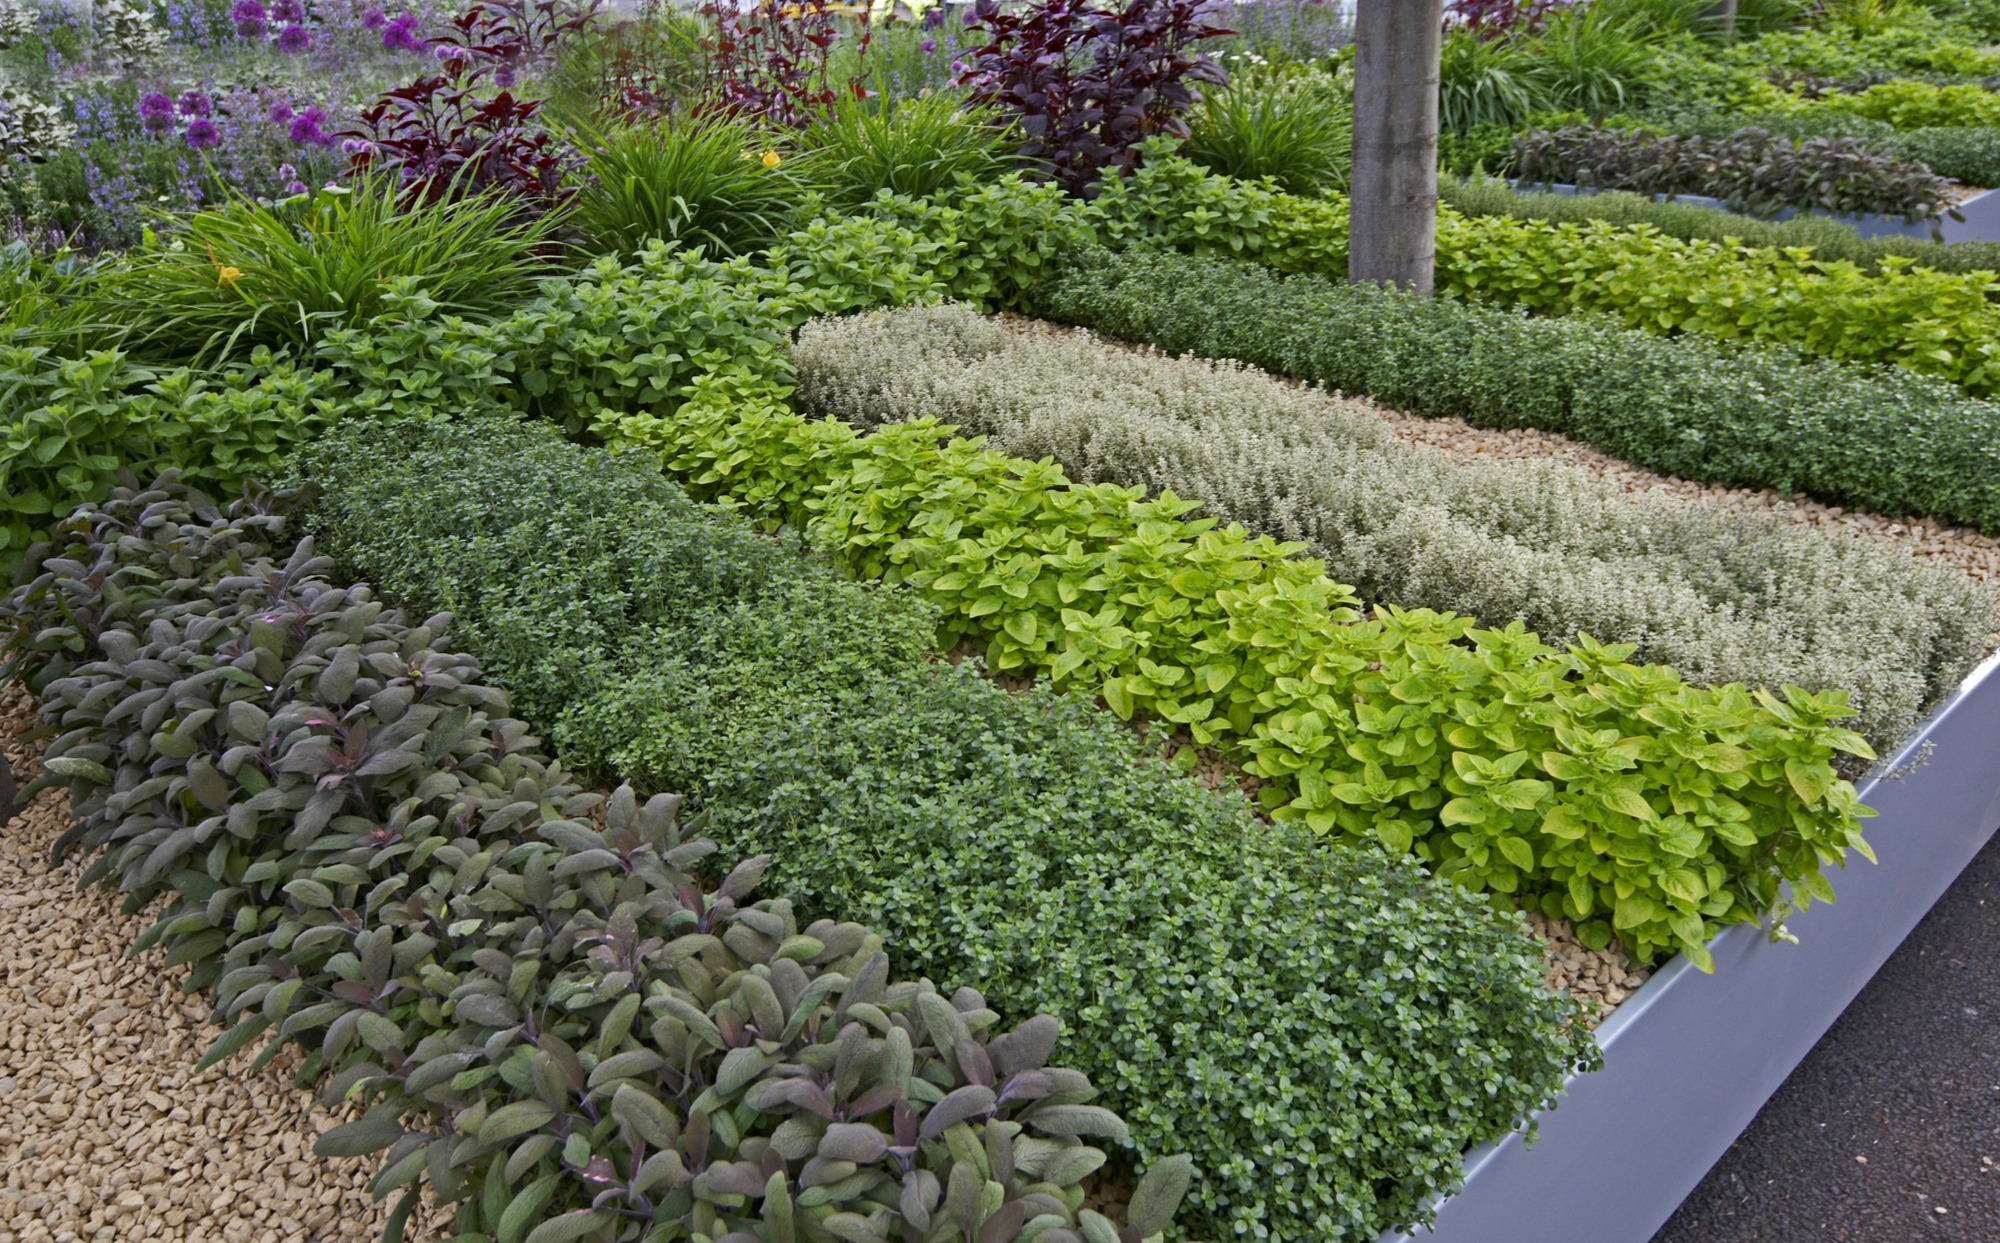 Alternative To Grass In Backyard